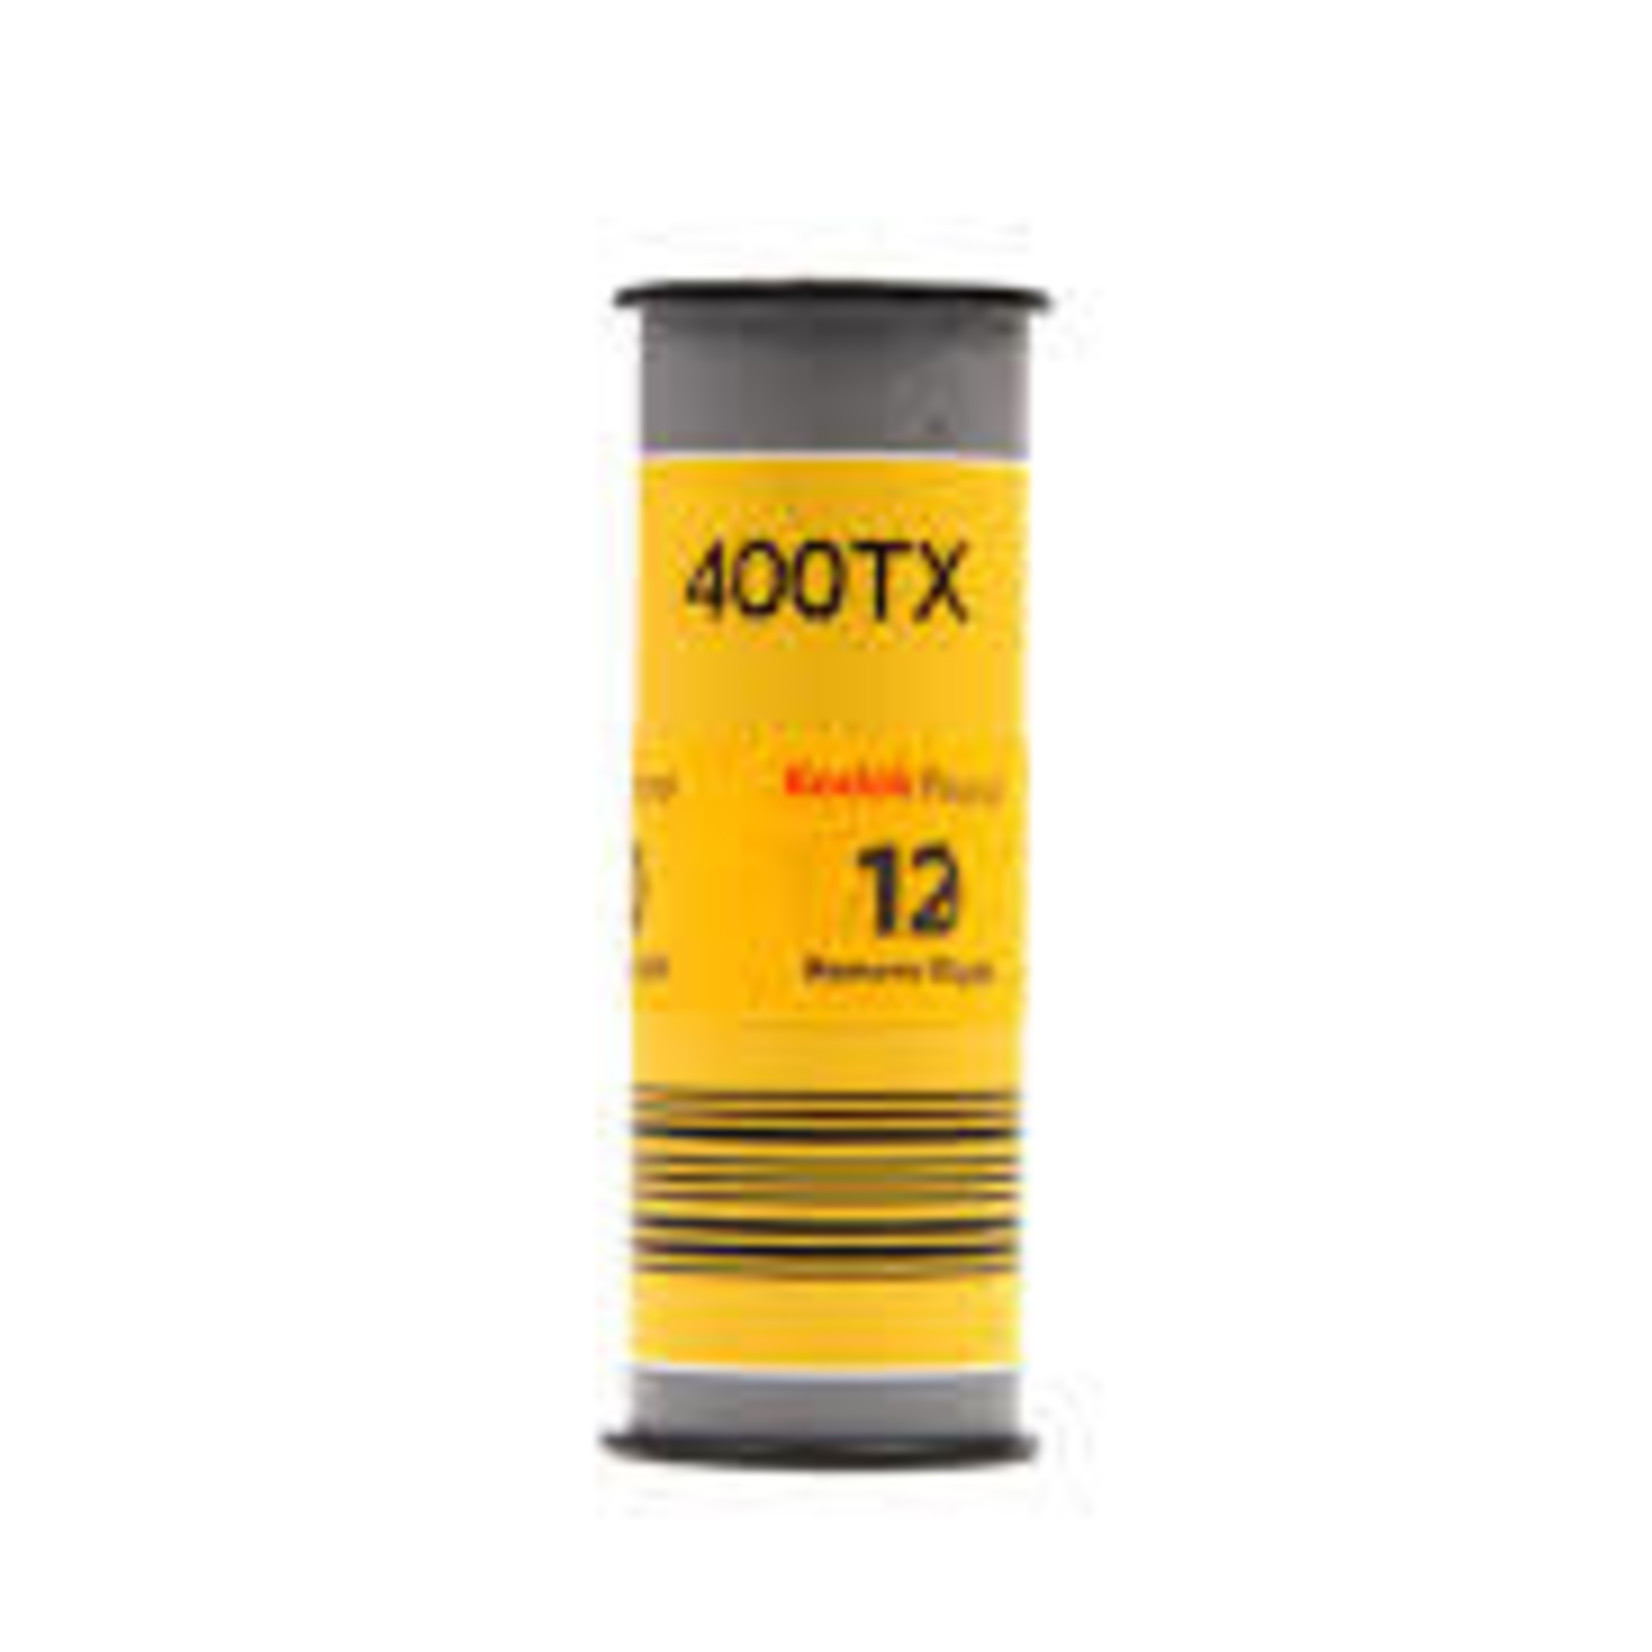 Kodak Professional Tri-X 400 Black and White Negative Film 120 Roll Film